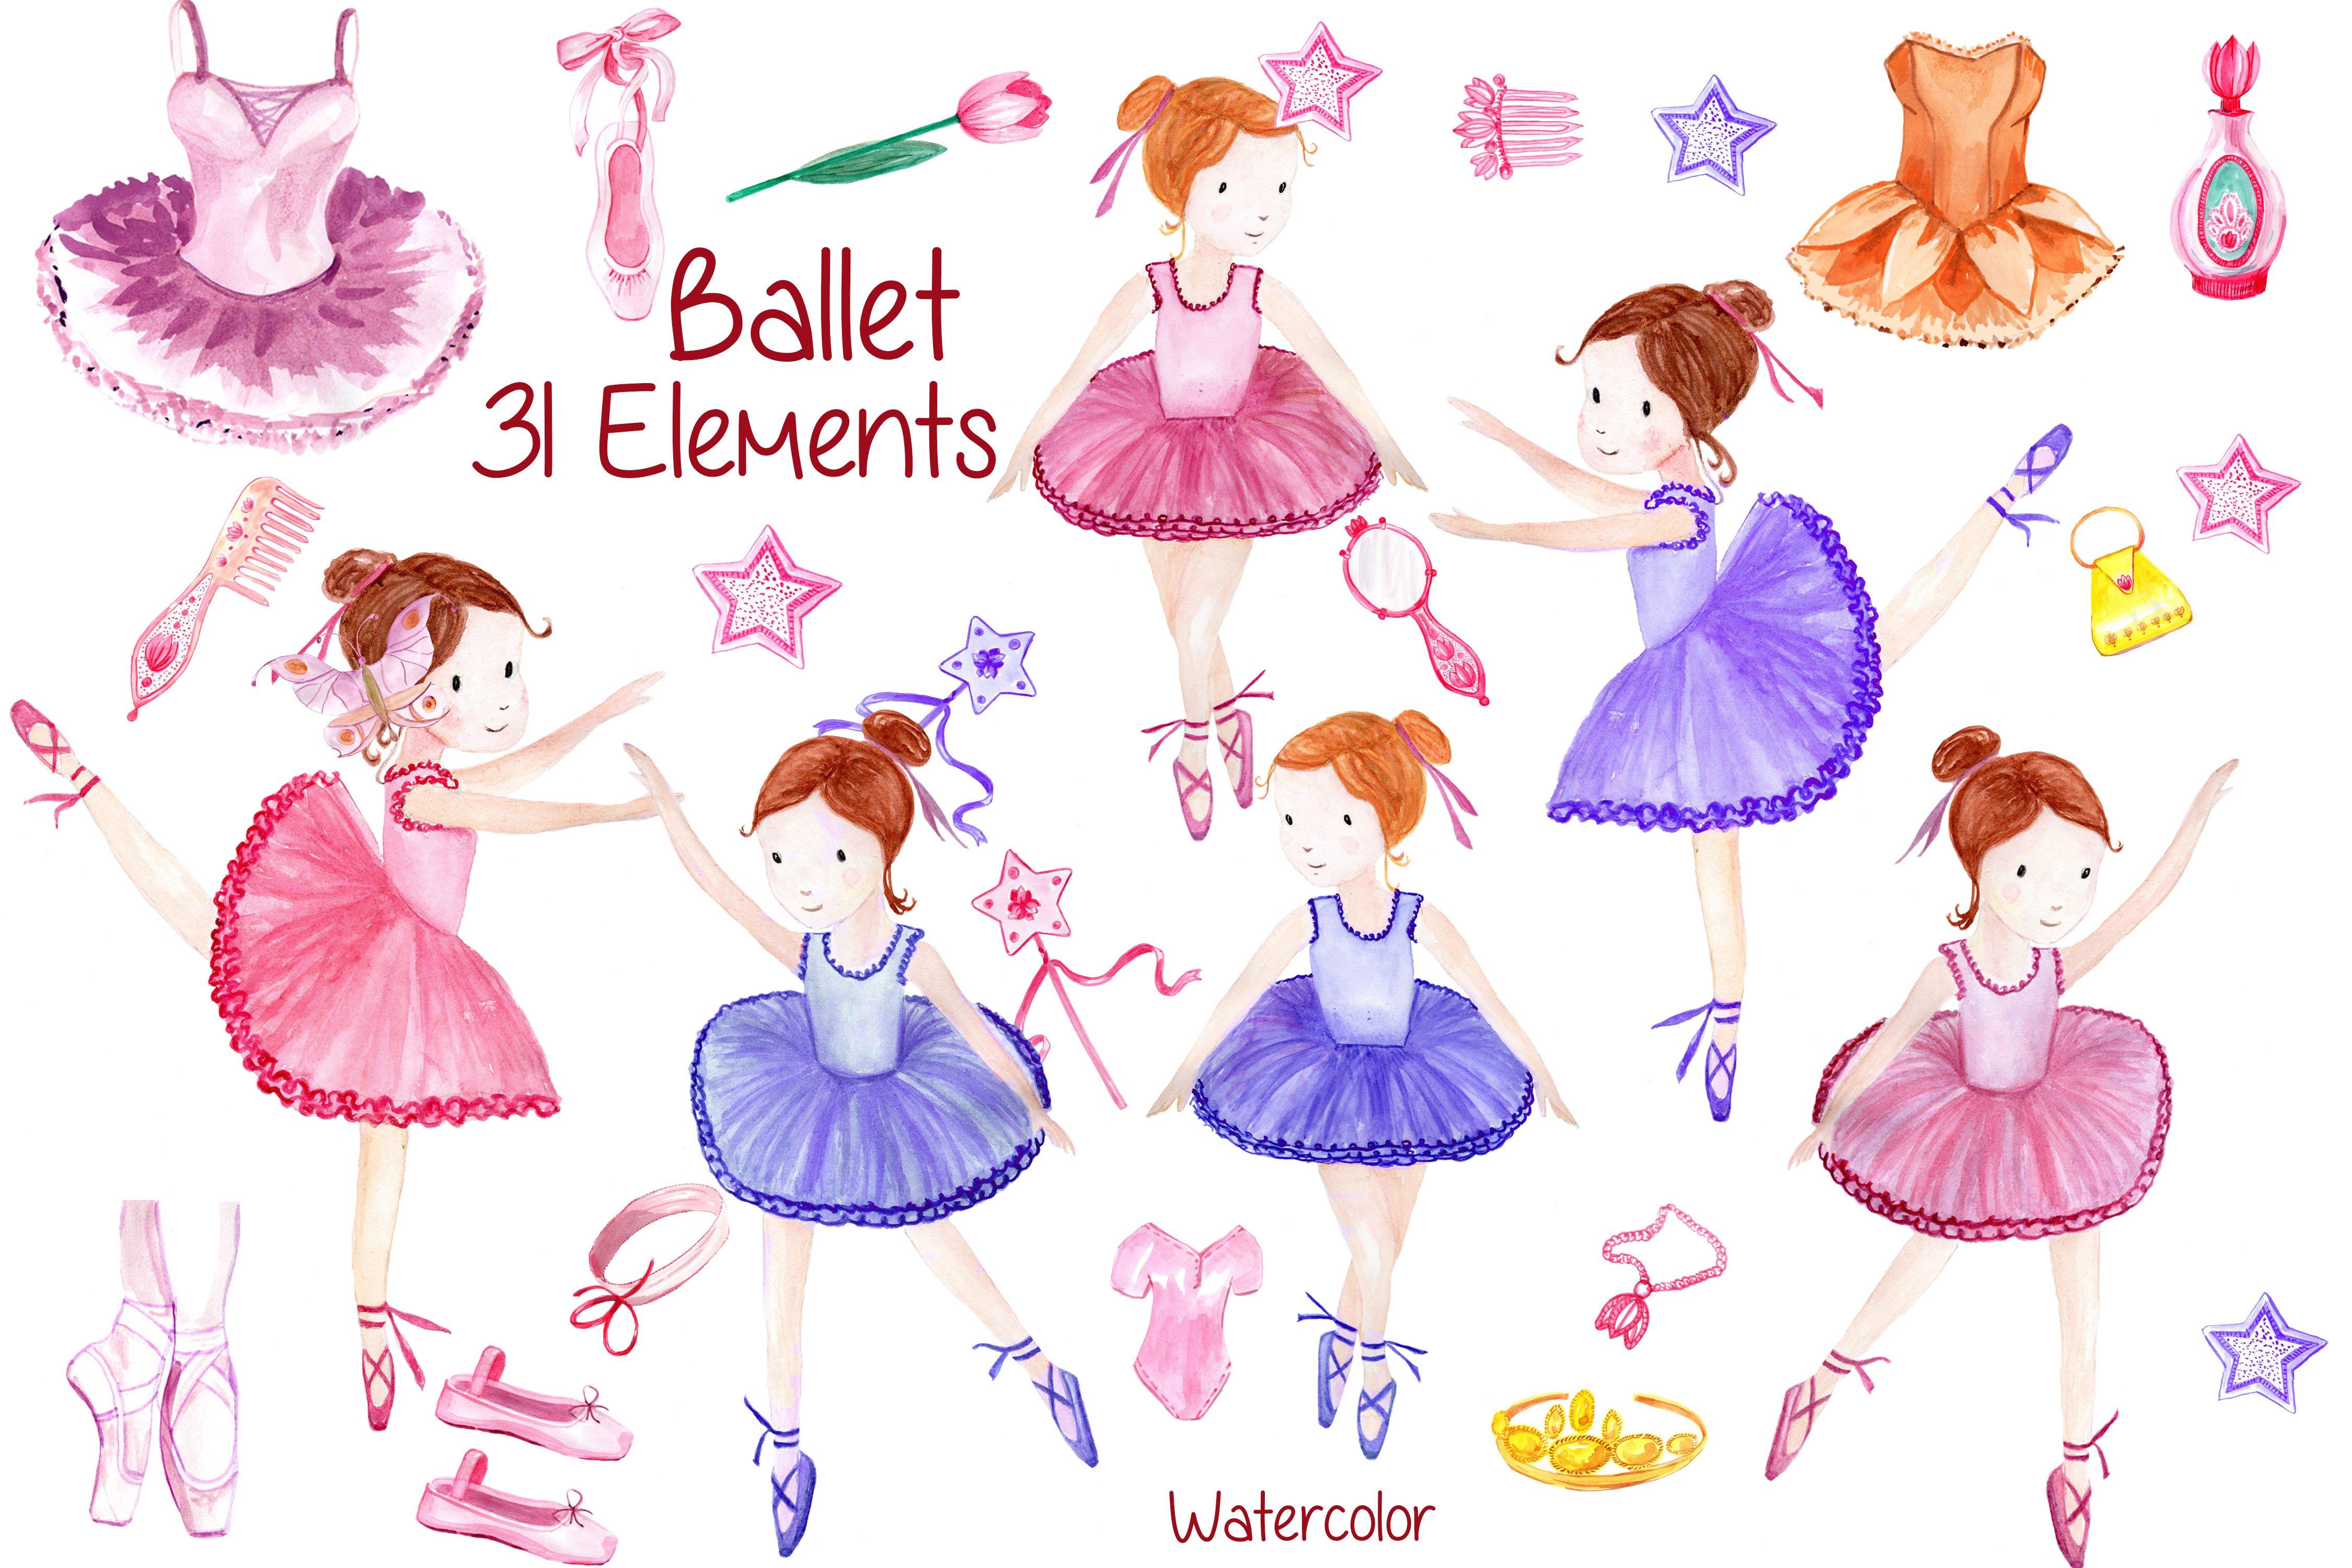 Watercolor ballerina clipart ~ Illustrations ~ Creative Market